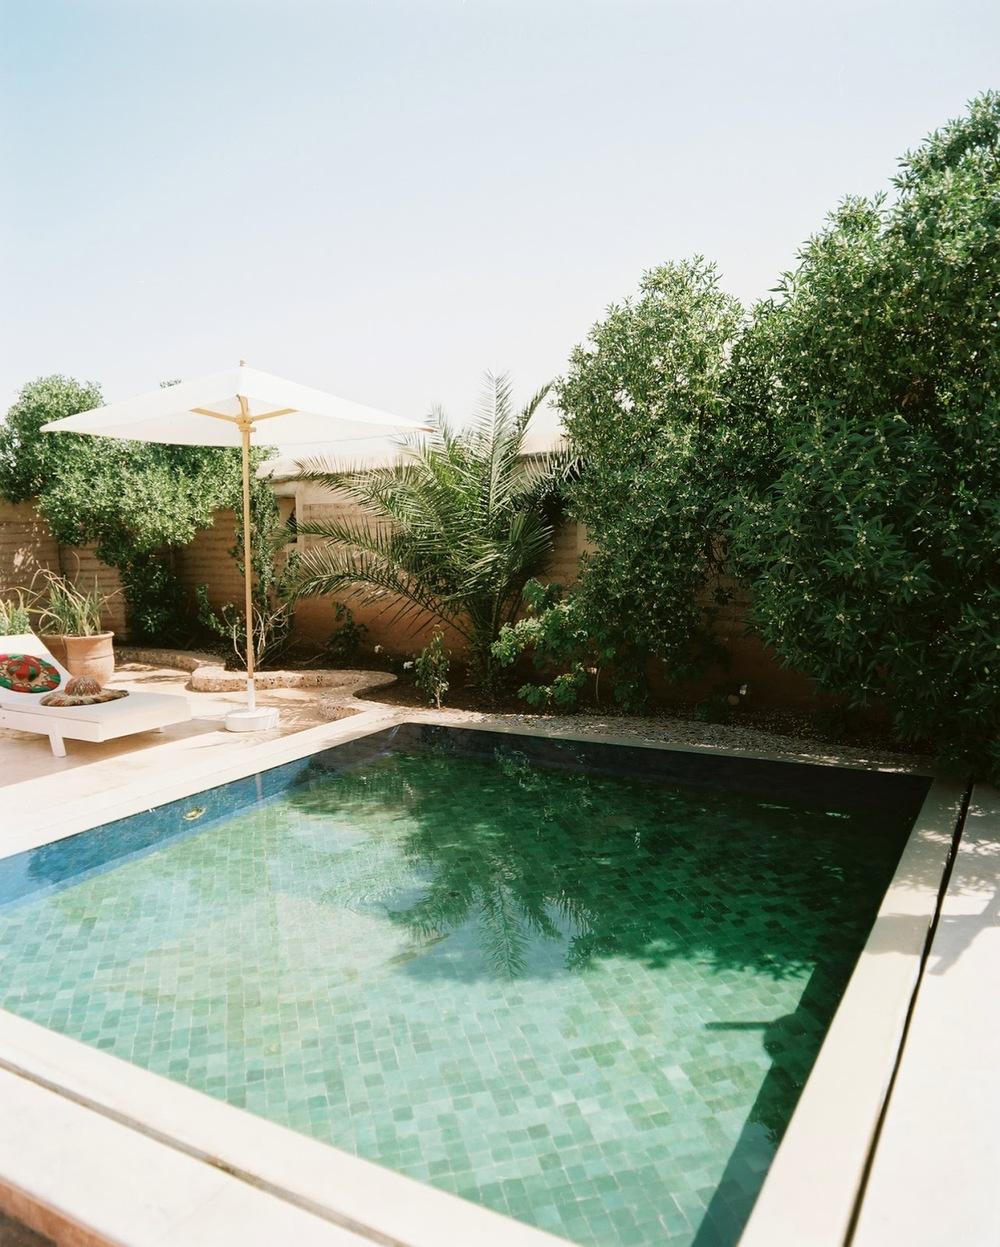 Cline+Morocco+Pool+Shot.jpg